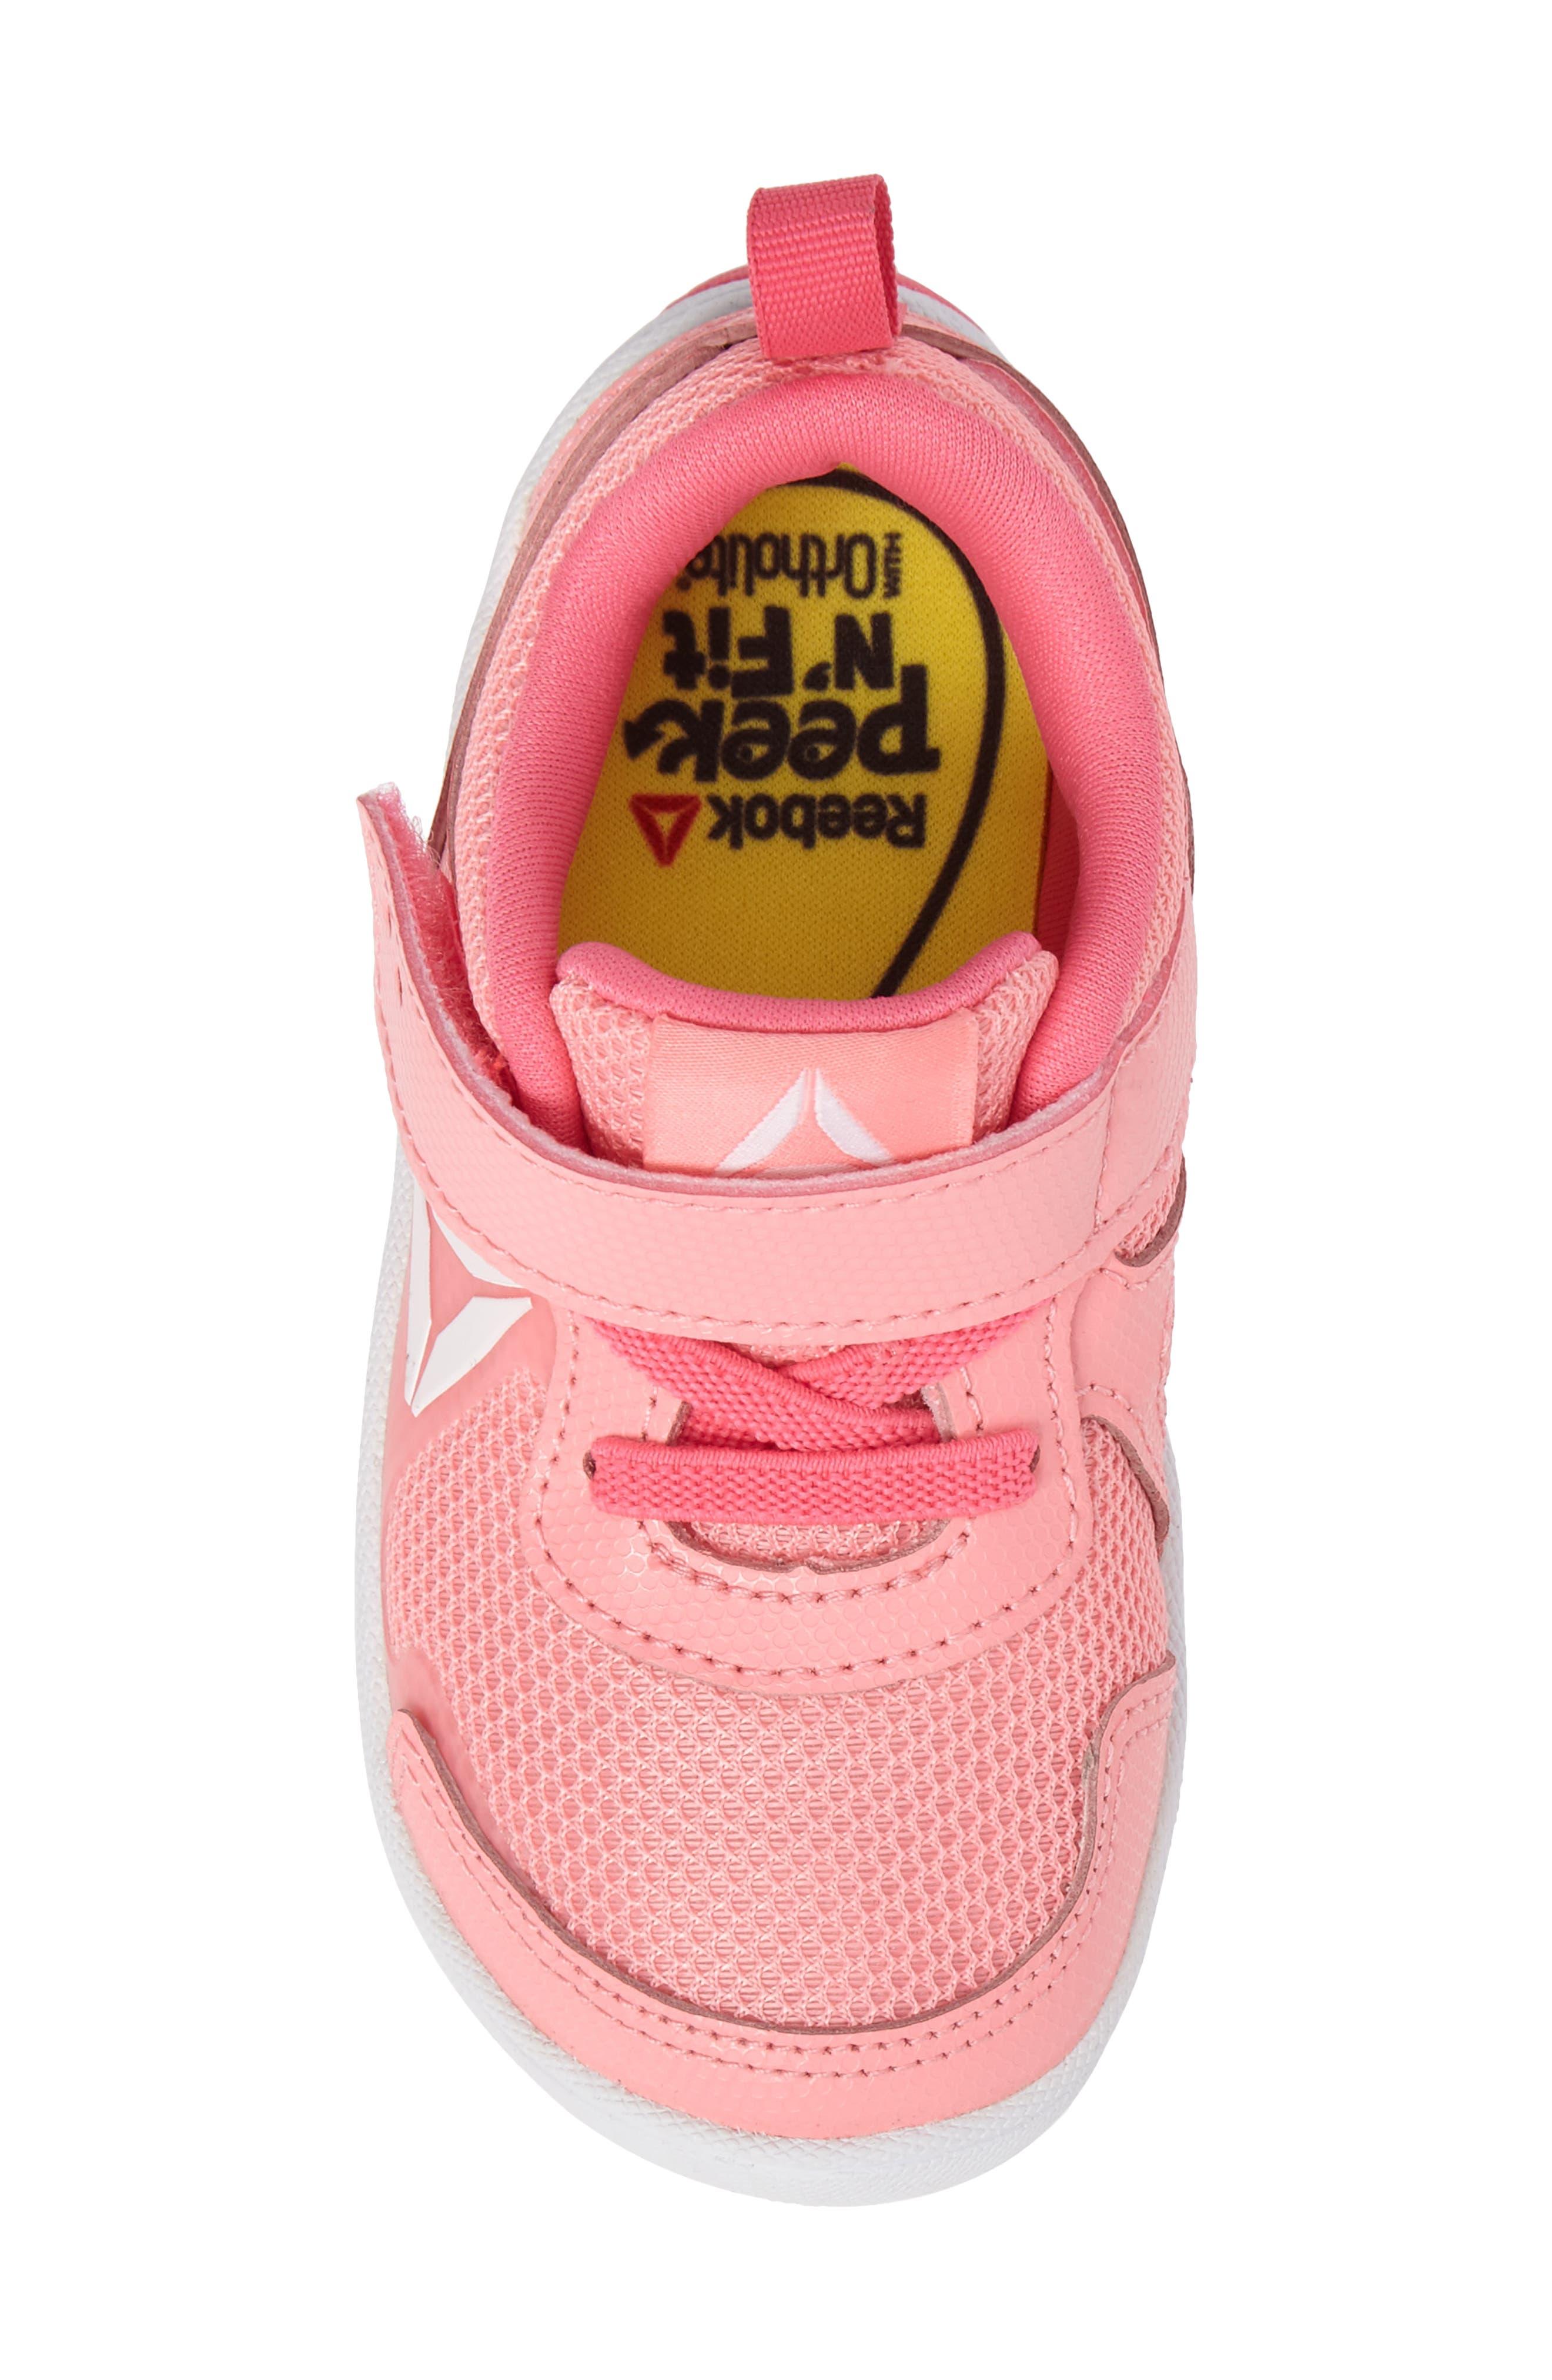 Ventureflex Stride 5.0 Sneaker,                             Alternate thumbnail 10, color,